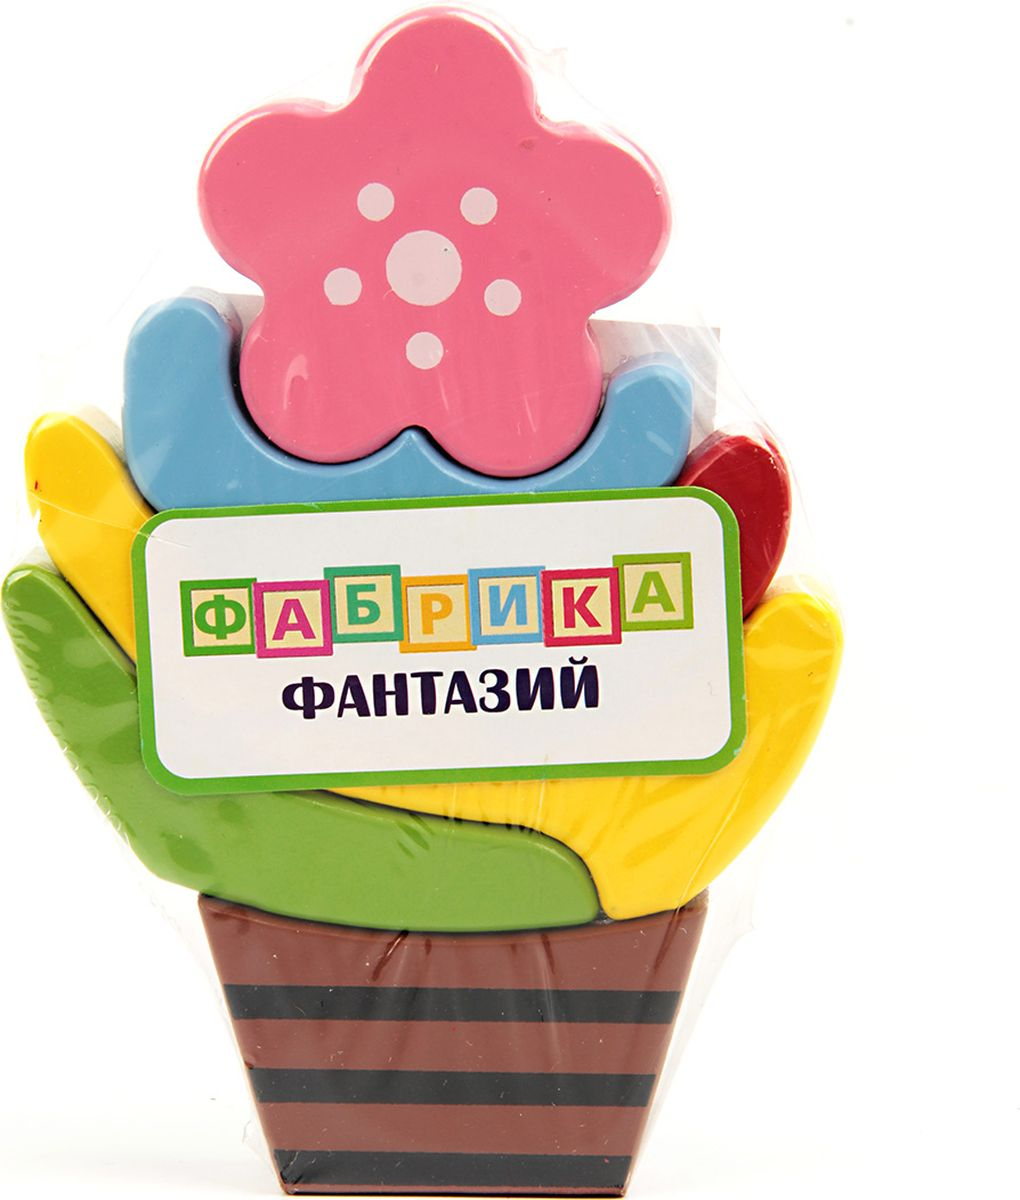 Фабрика Фантазий Развивающая игрушка Баланс 60095